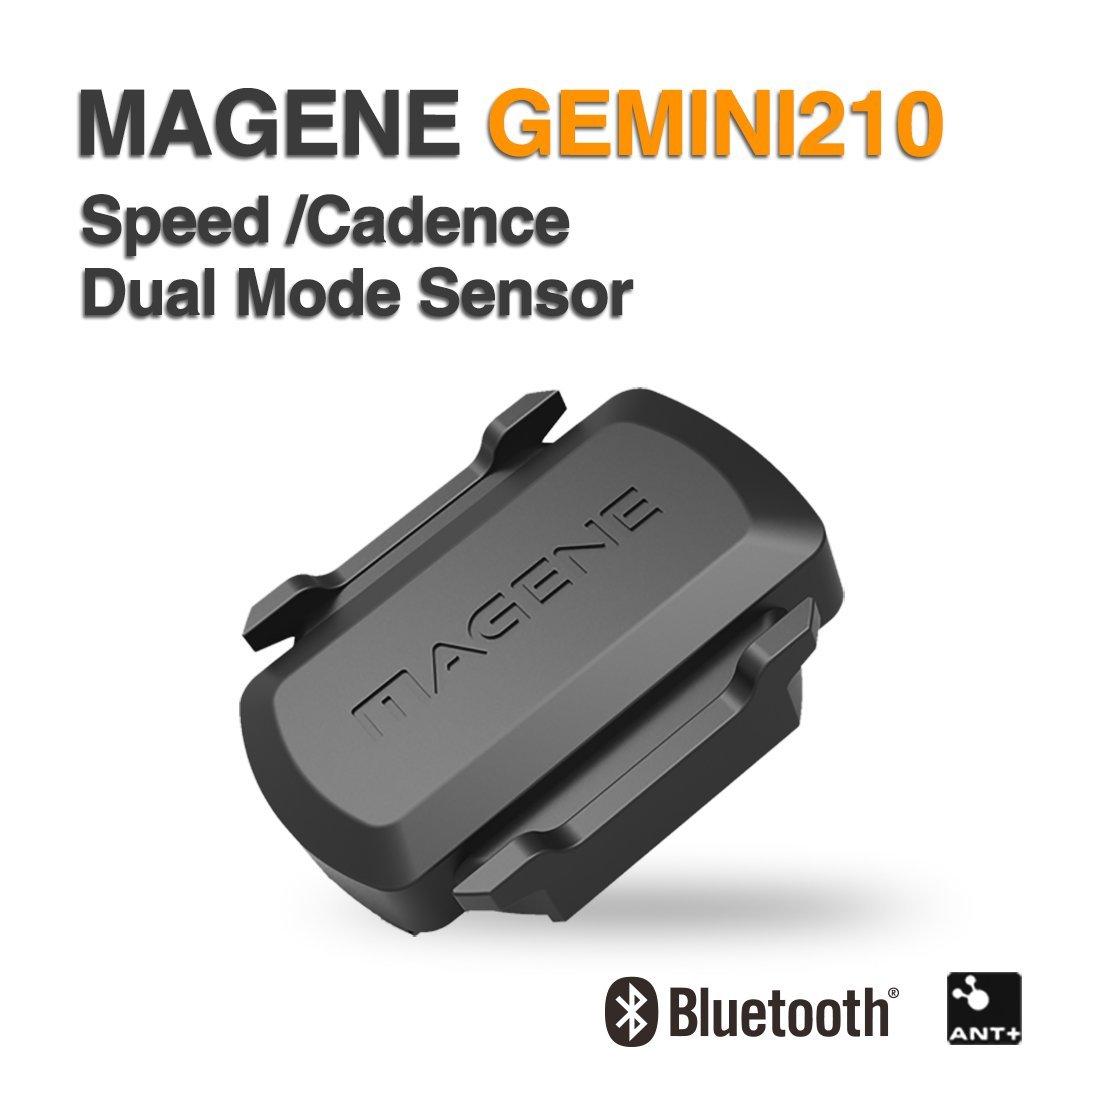 Magene Bicicleta Speed/Cadence 2 en 1 Sensor ANT+ Bluetooth Multiprotocolo Soporte GEMINI210 (Speed/Cadence Sensor)